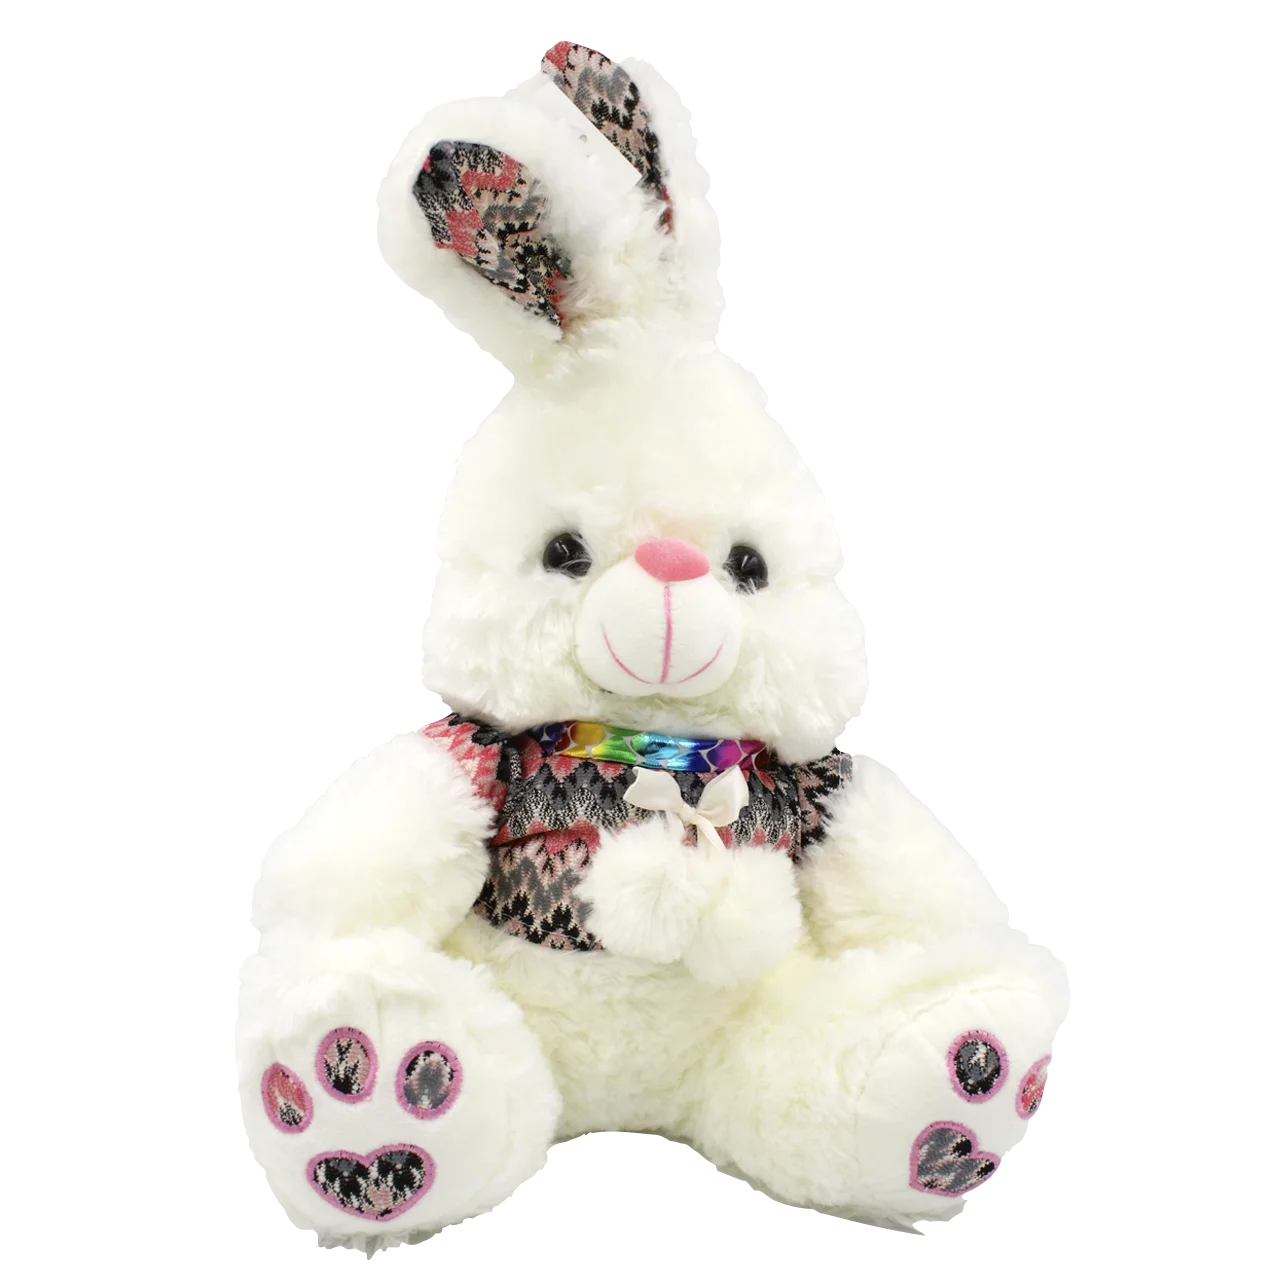 Мягкая игрушка Плюшевый Заяц Белый 31 см